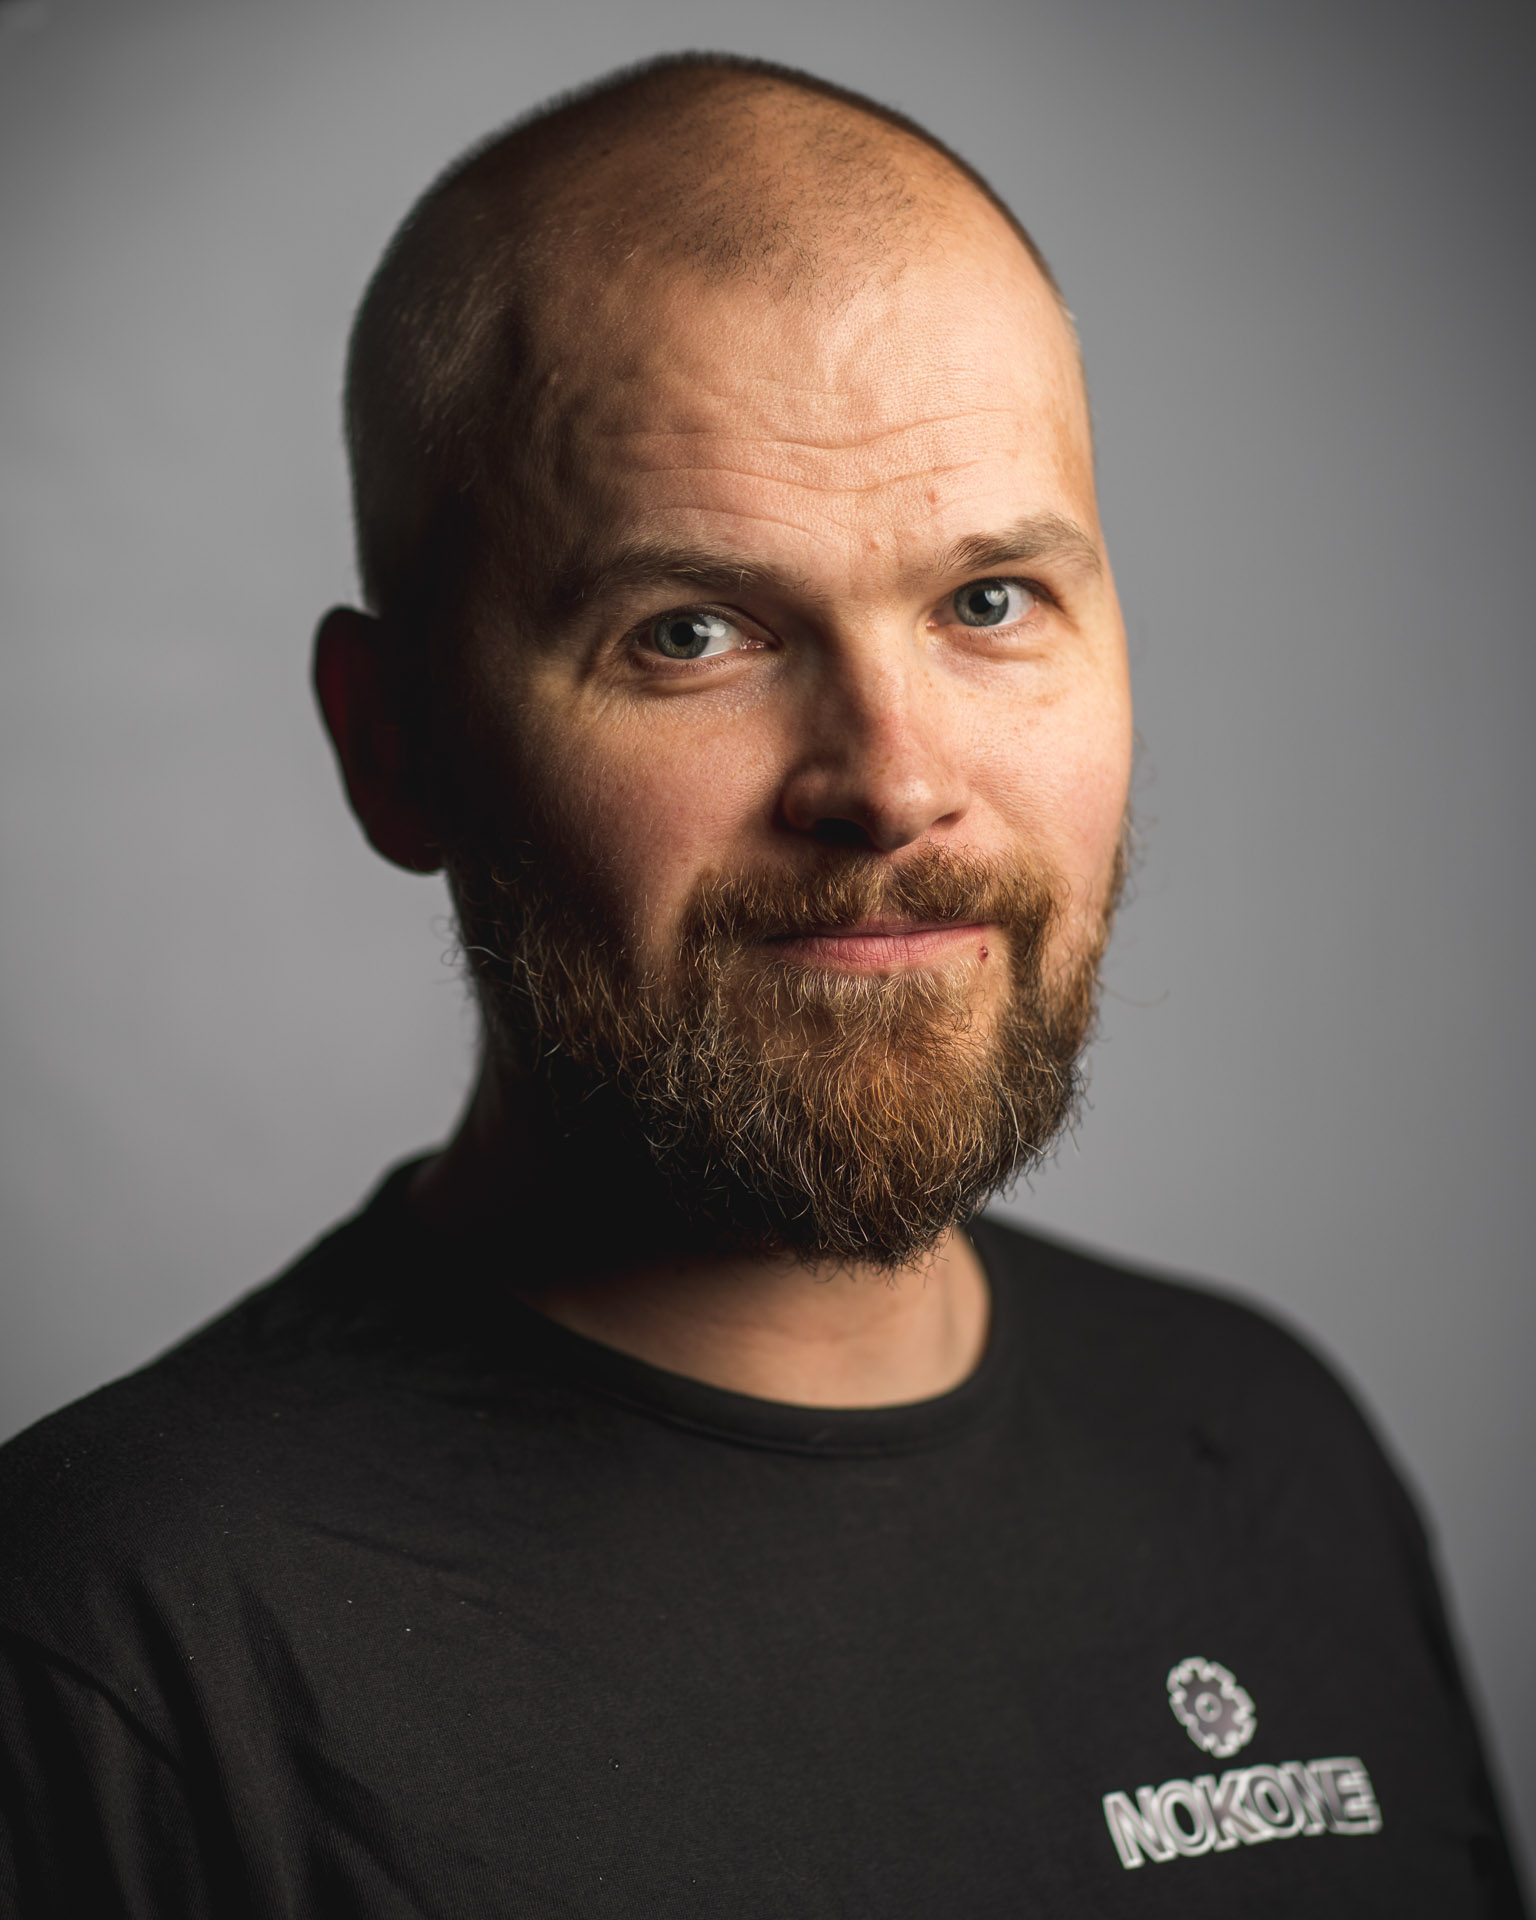 Juho Nokelainen